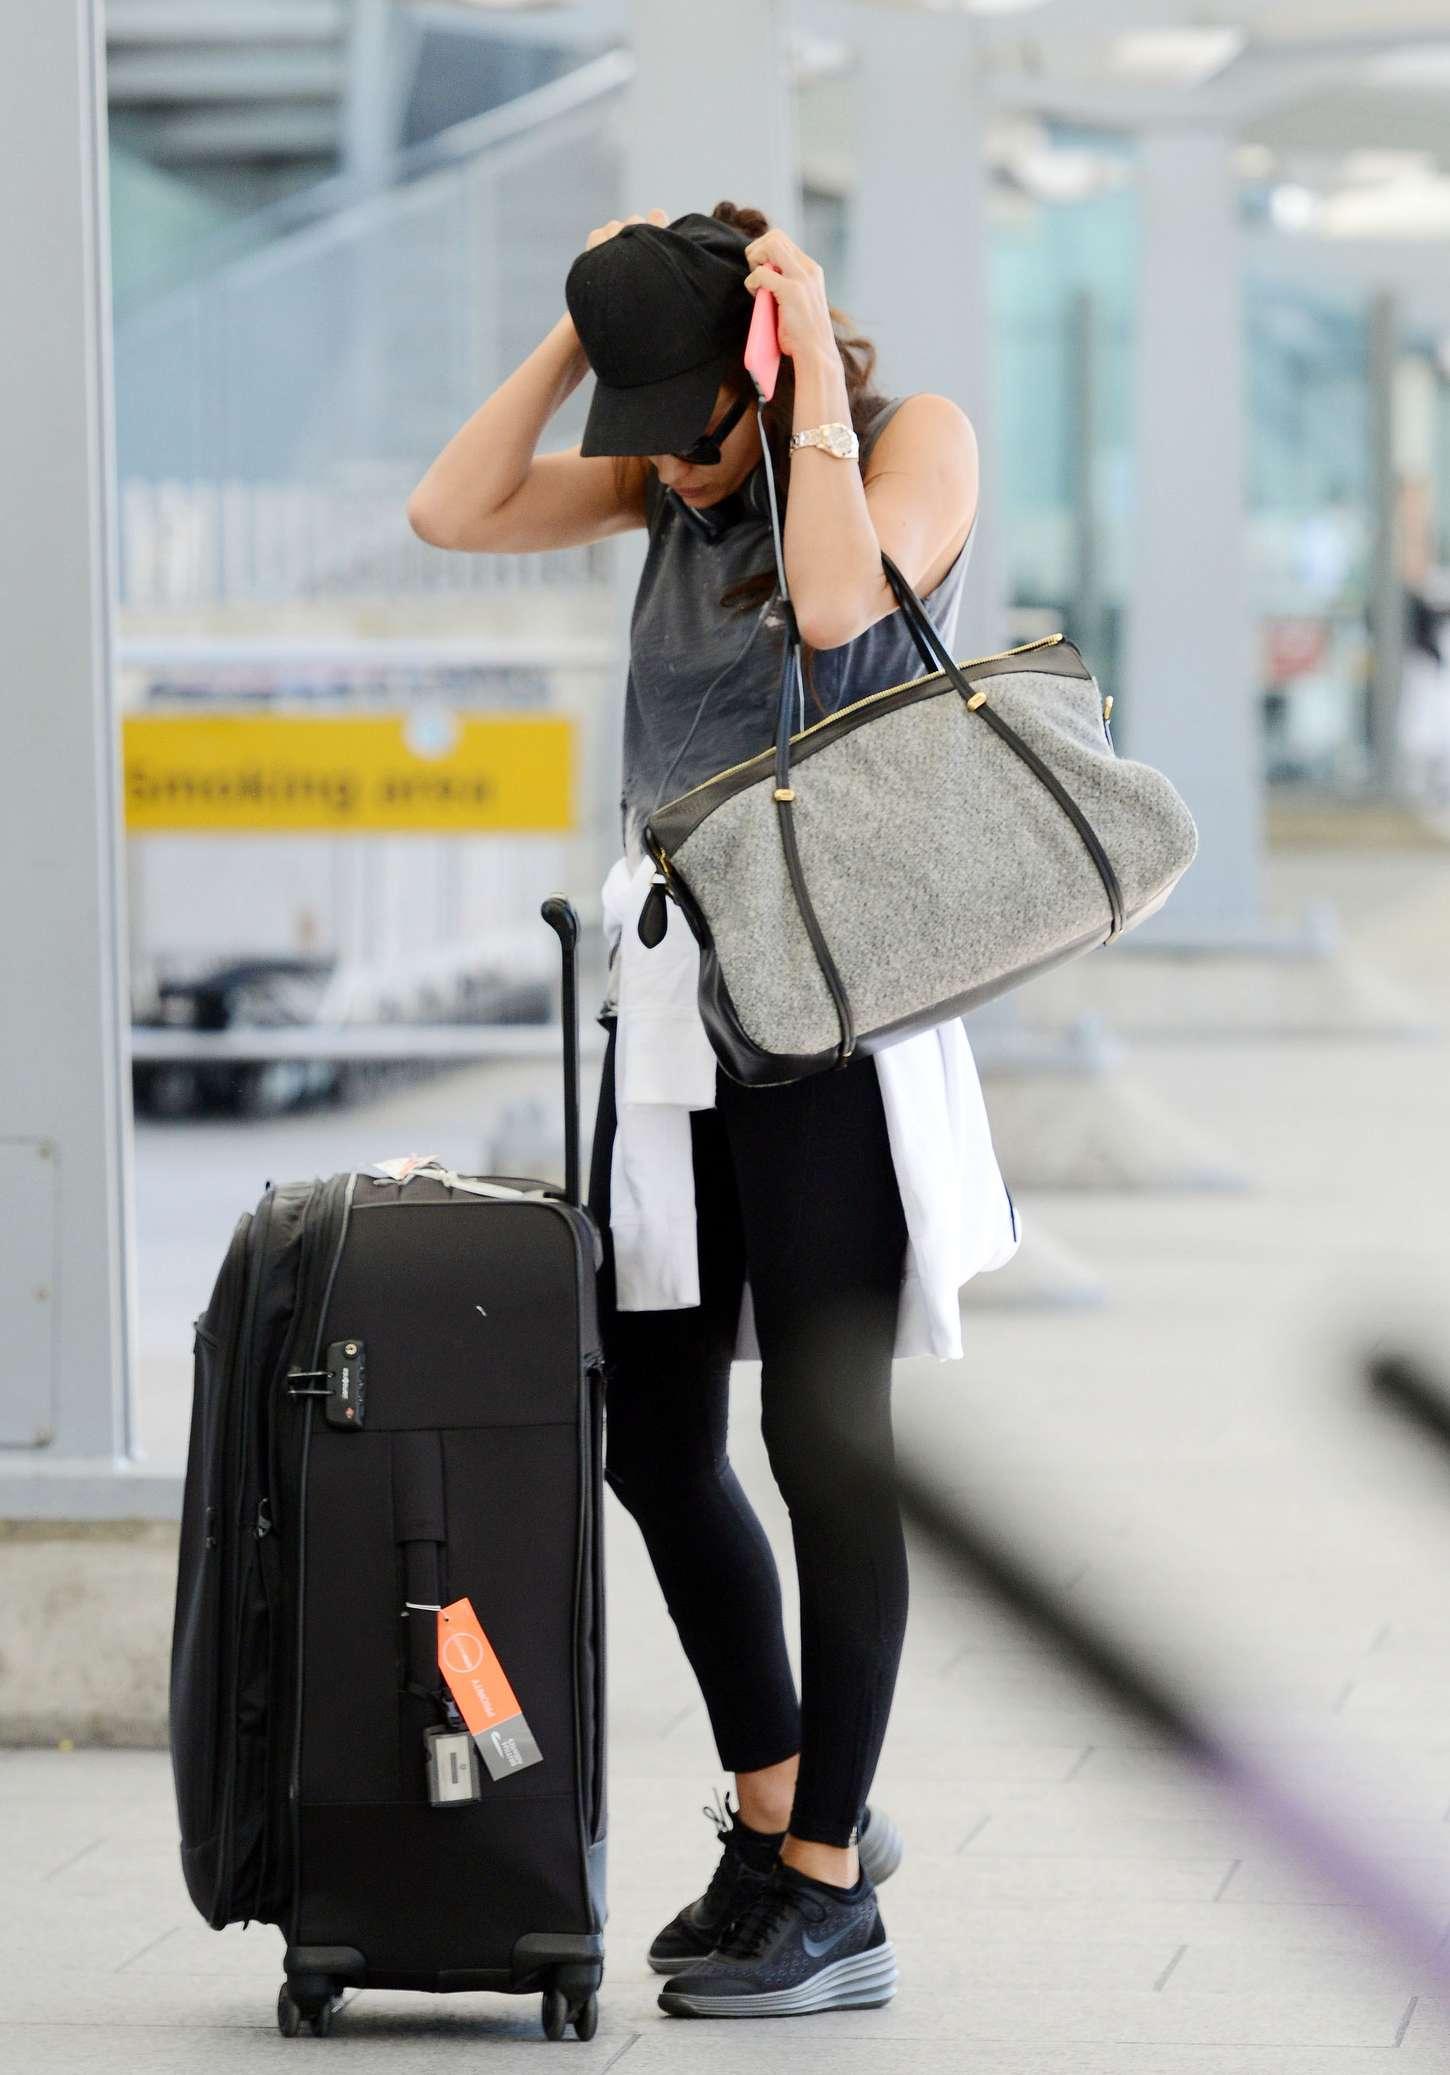 Irina Shayk 2015 : Irina Shayk in Leggings at Heathrow airport -13